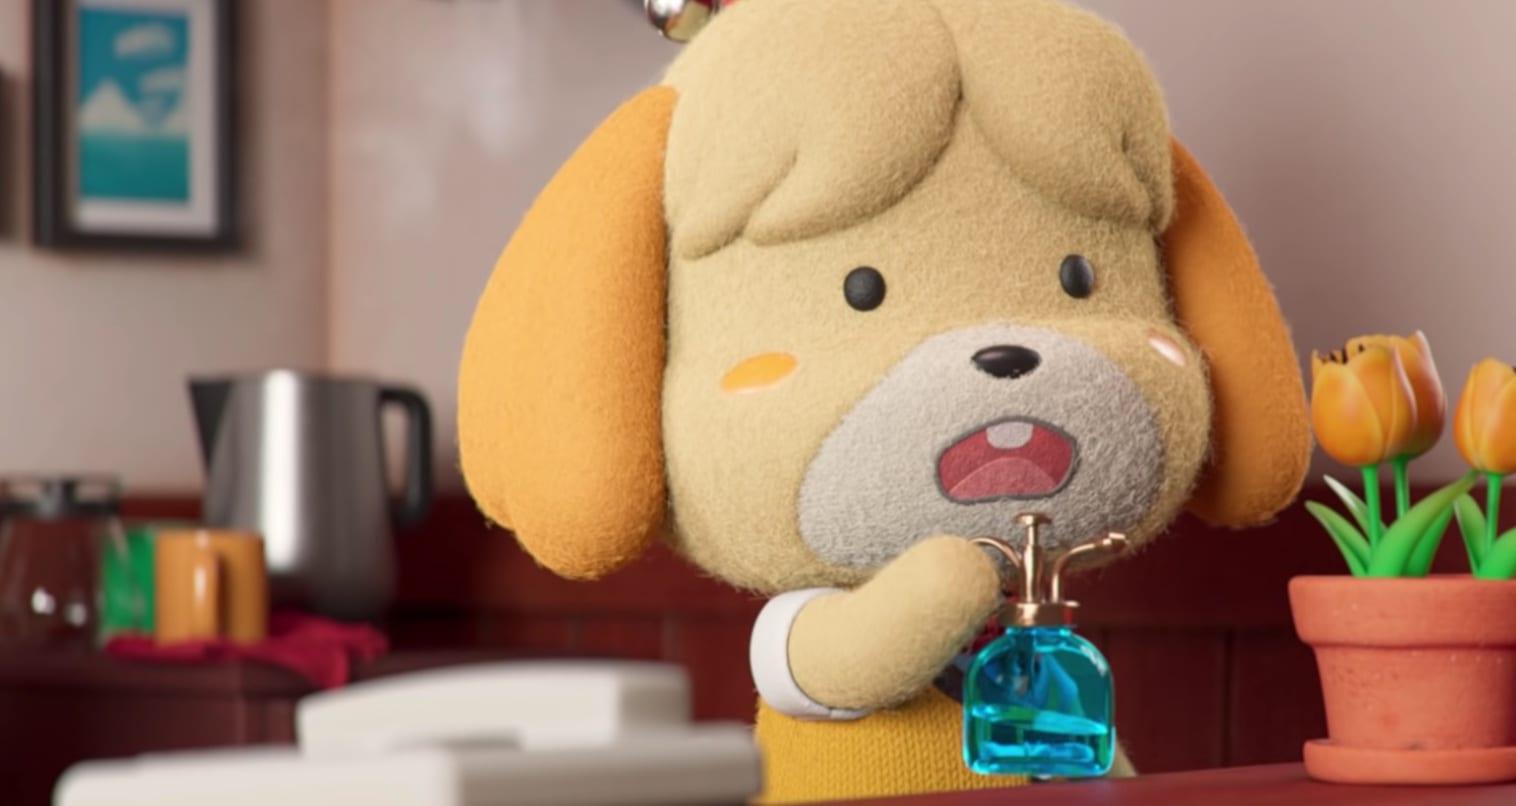 Fan-Made Animal Crossing Video Impressed by Rilakkuma & Kaoru Is Too Dang Cute 1